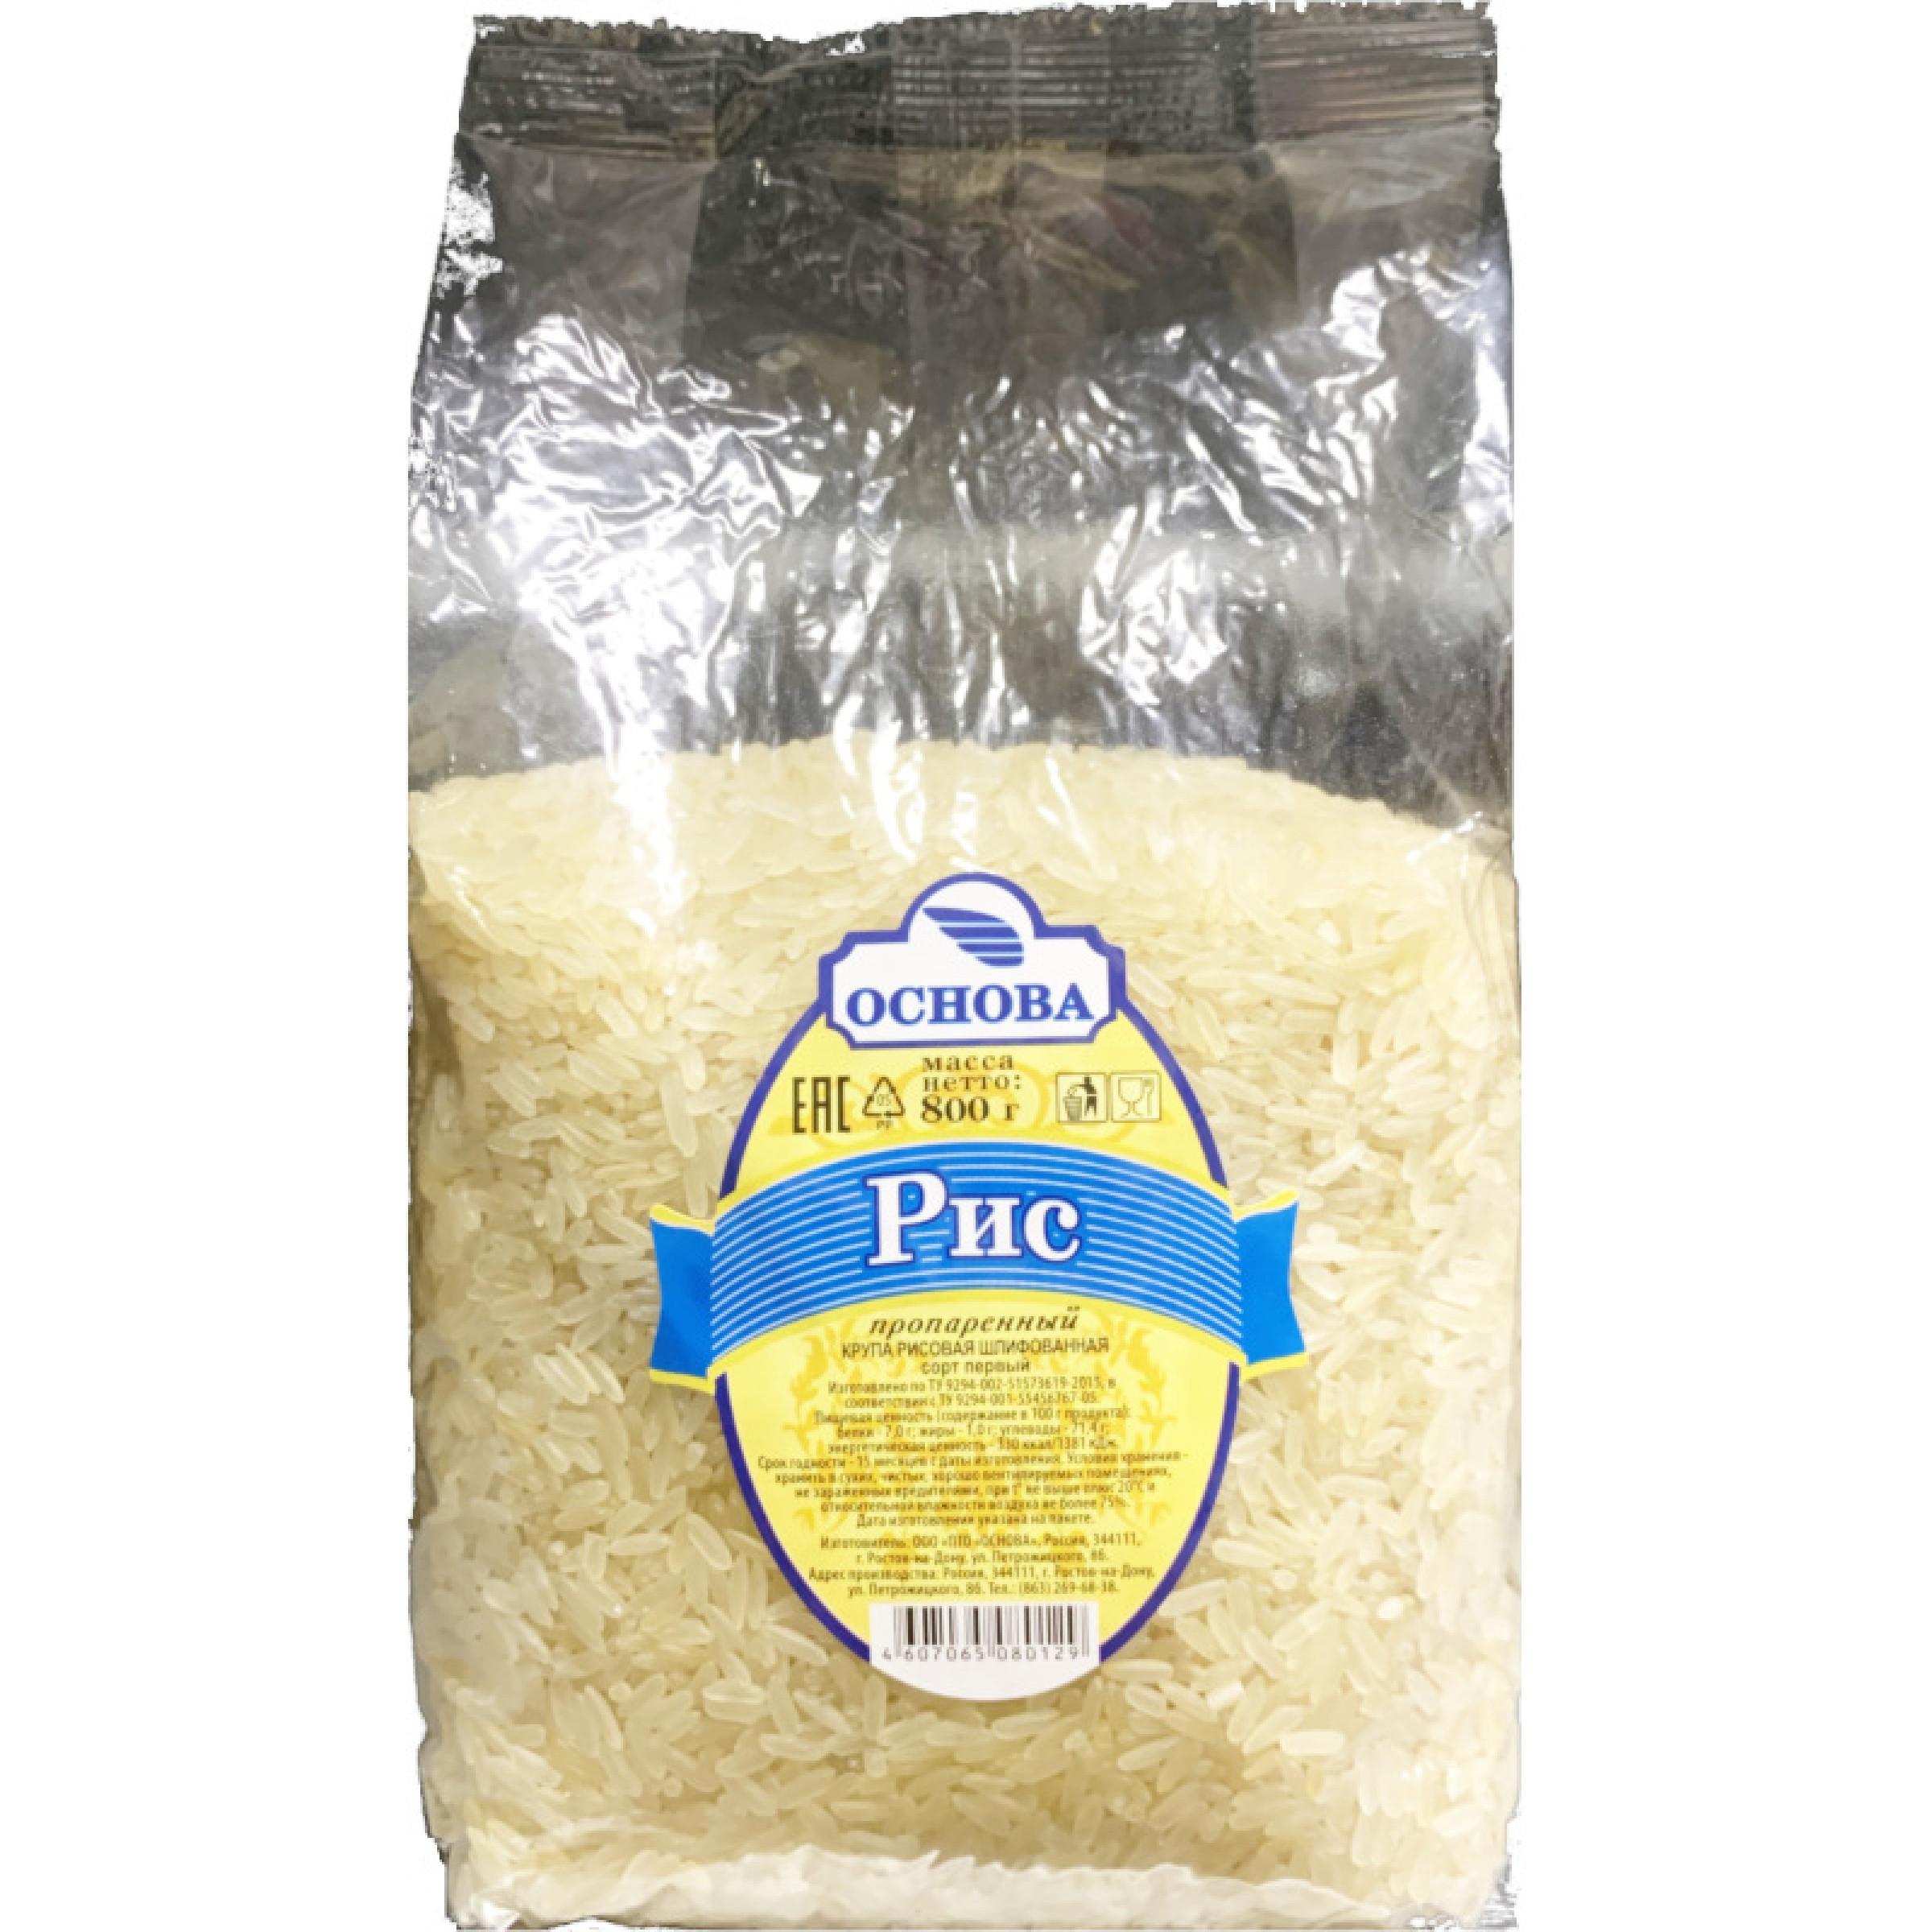 Рис пропаренный Основа, 800гр